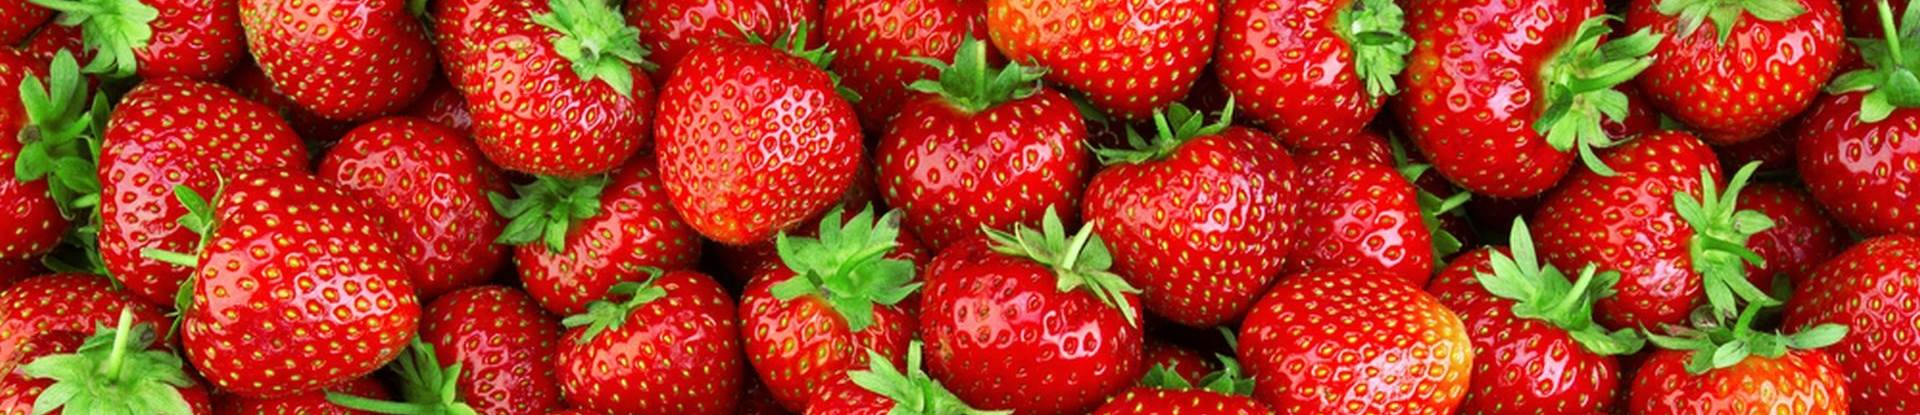 selvpluk jordbær nordjylland